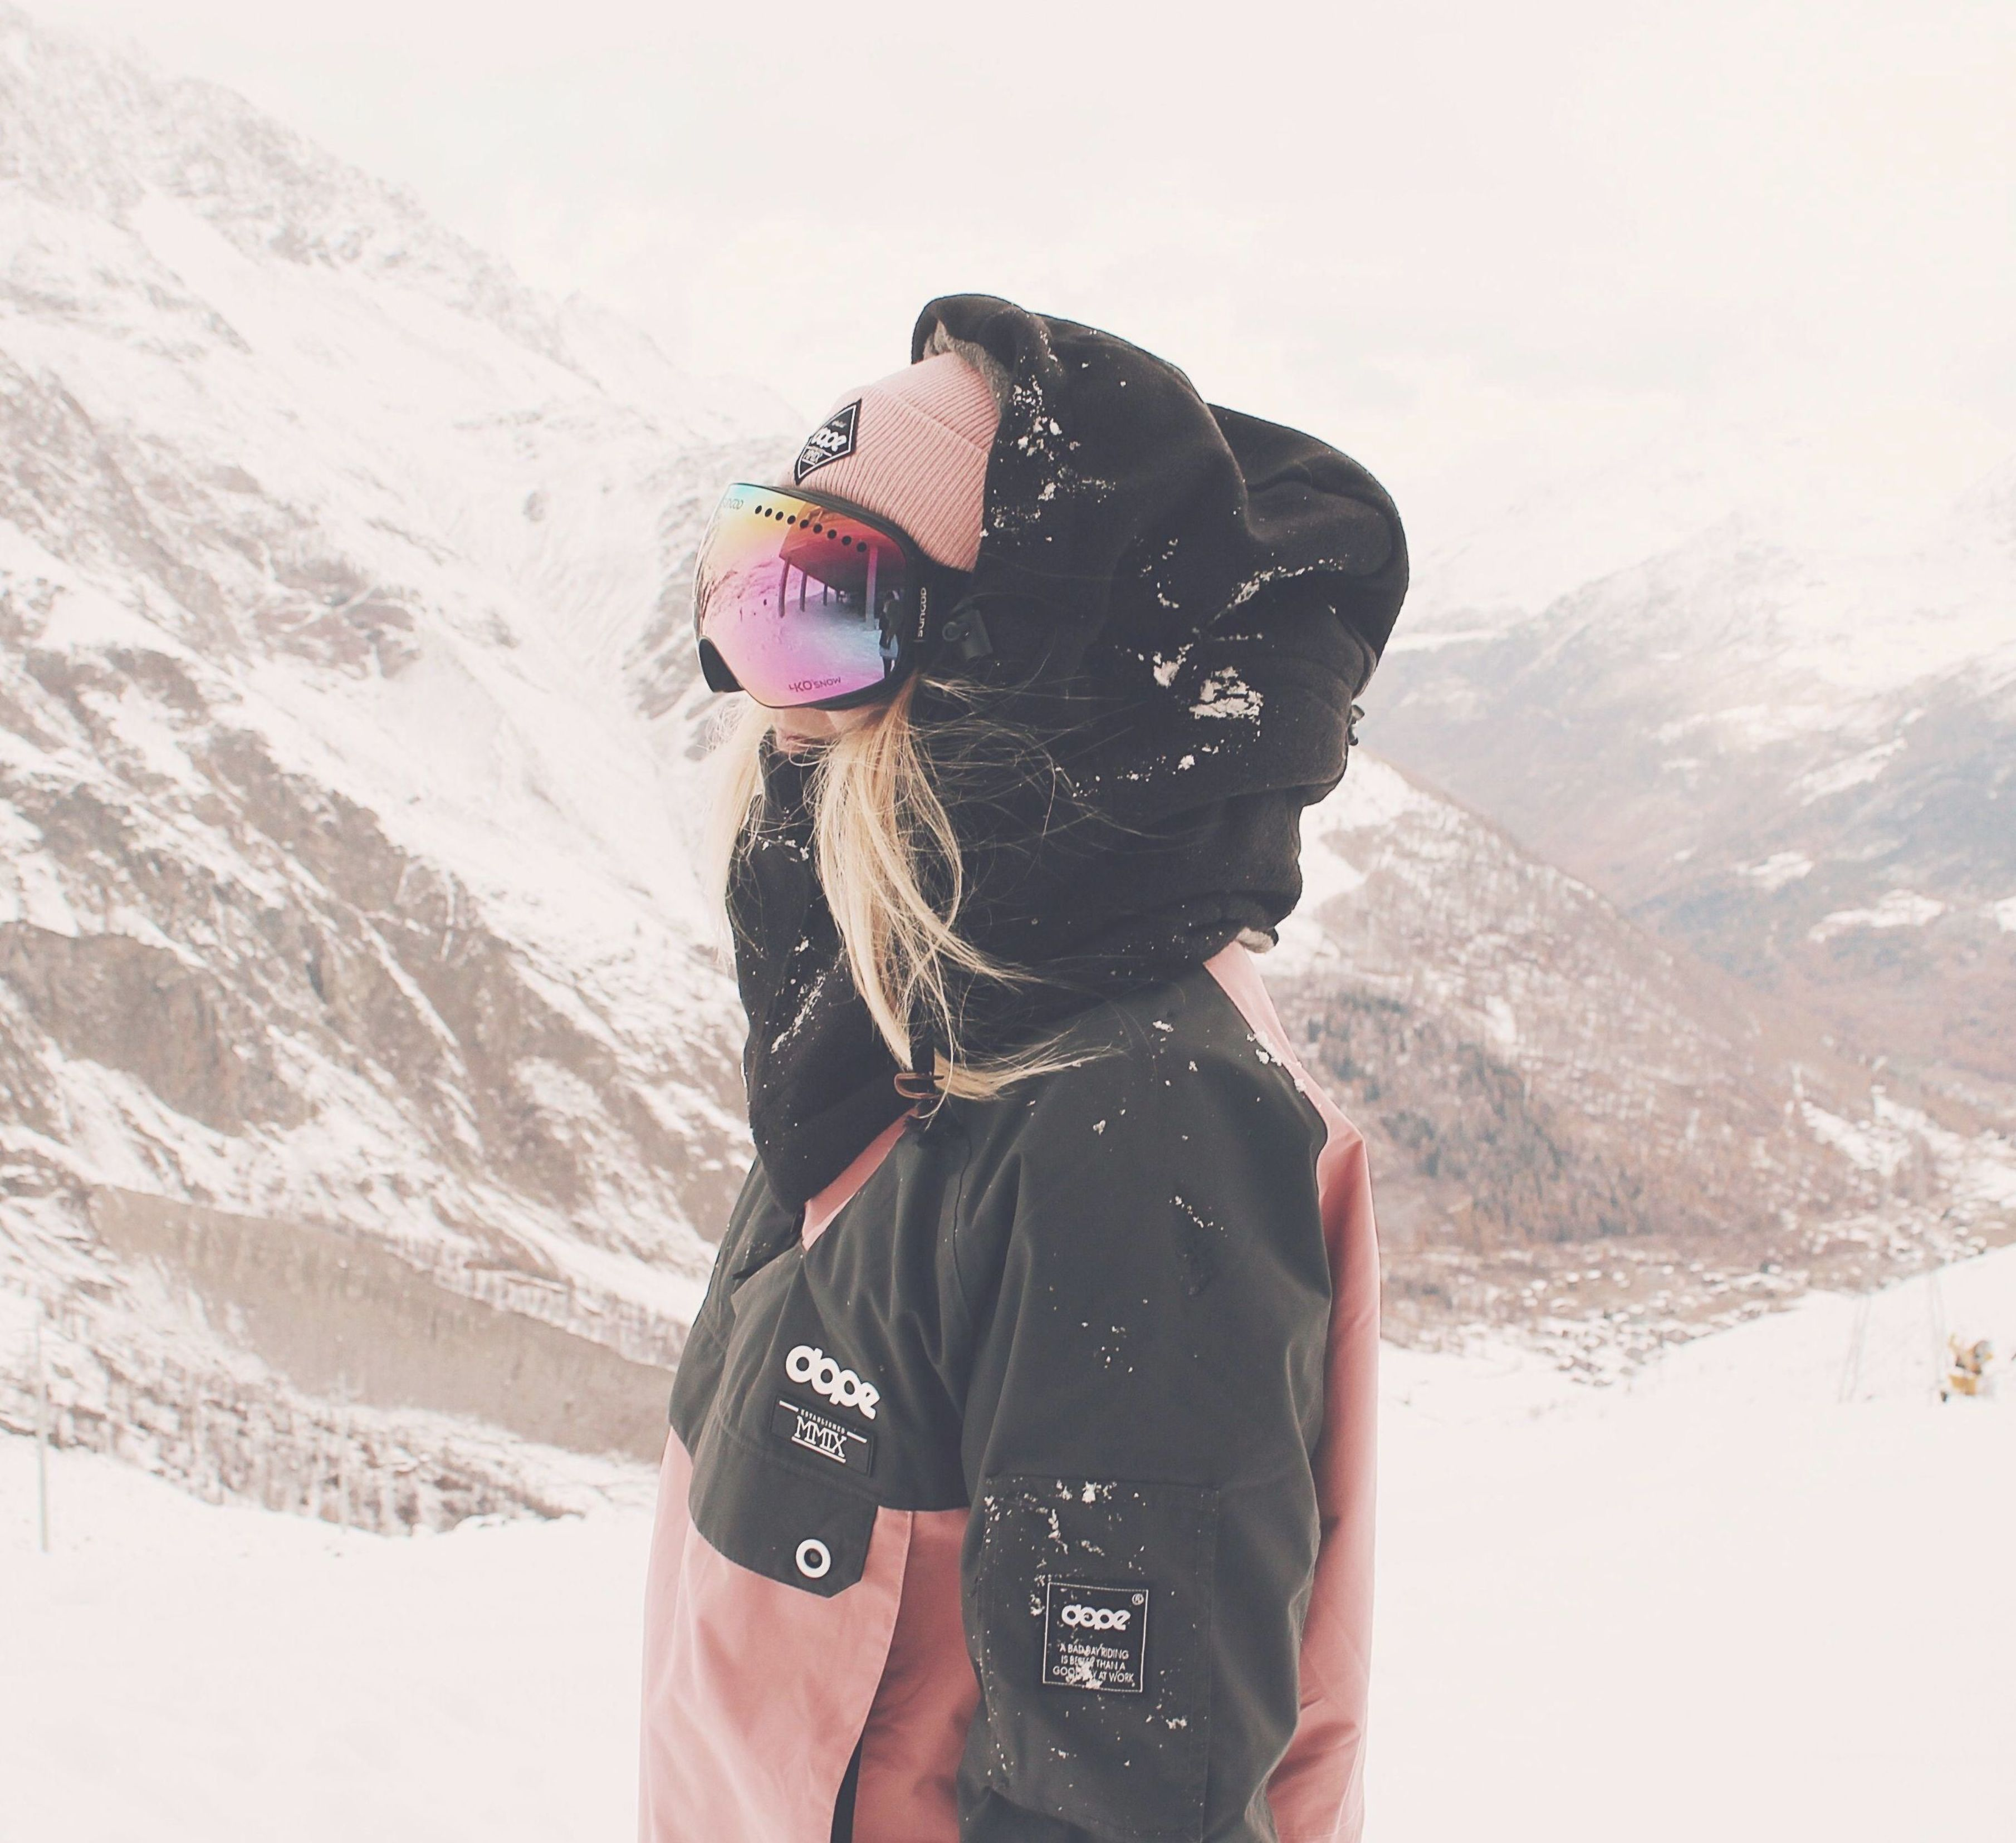 Snowboard styl snowboard style Snowboarding style